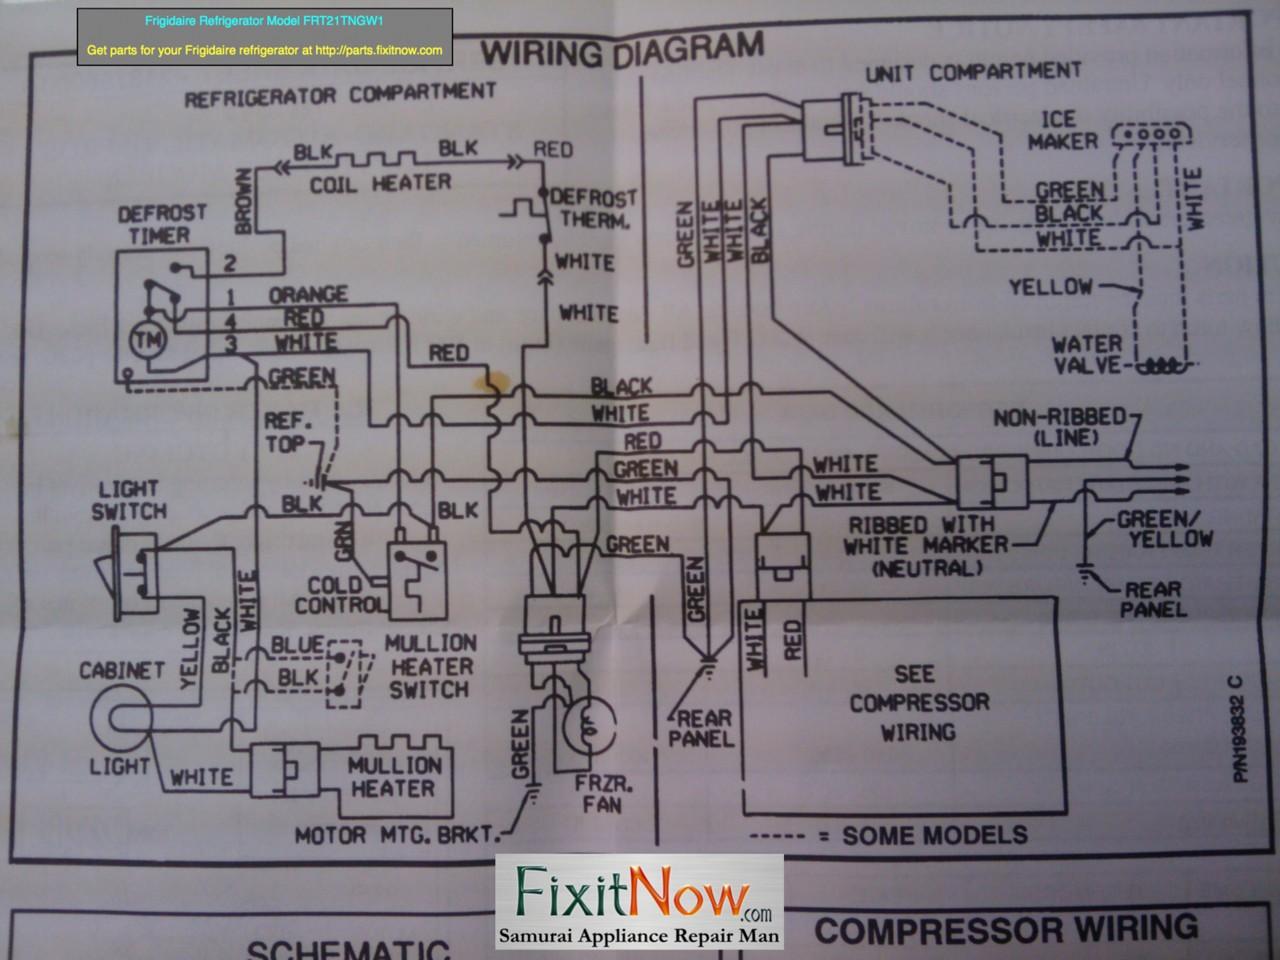 Whirlpool Frost Free Refrigerator Circuit Diagram - Golf 1 Alternator Wiring  Diagram - fusebox.1997wir.jeanjaures37.frWiring Diagram Resource